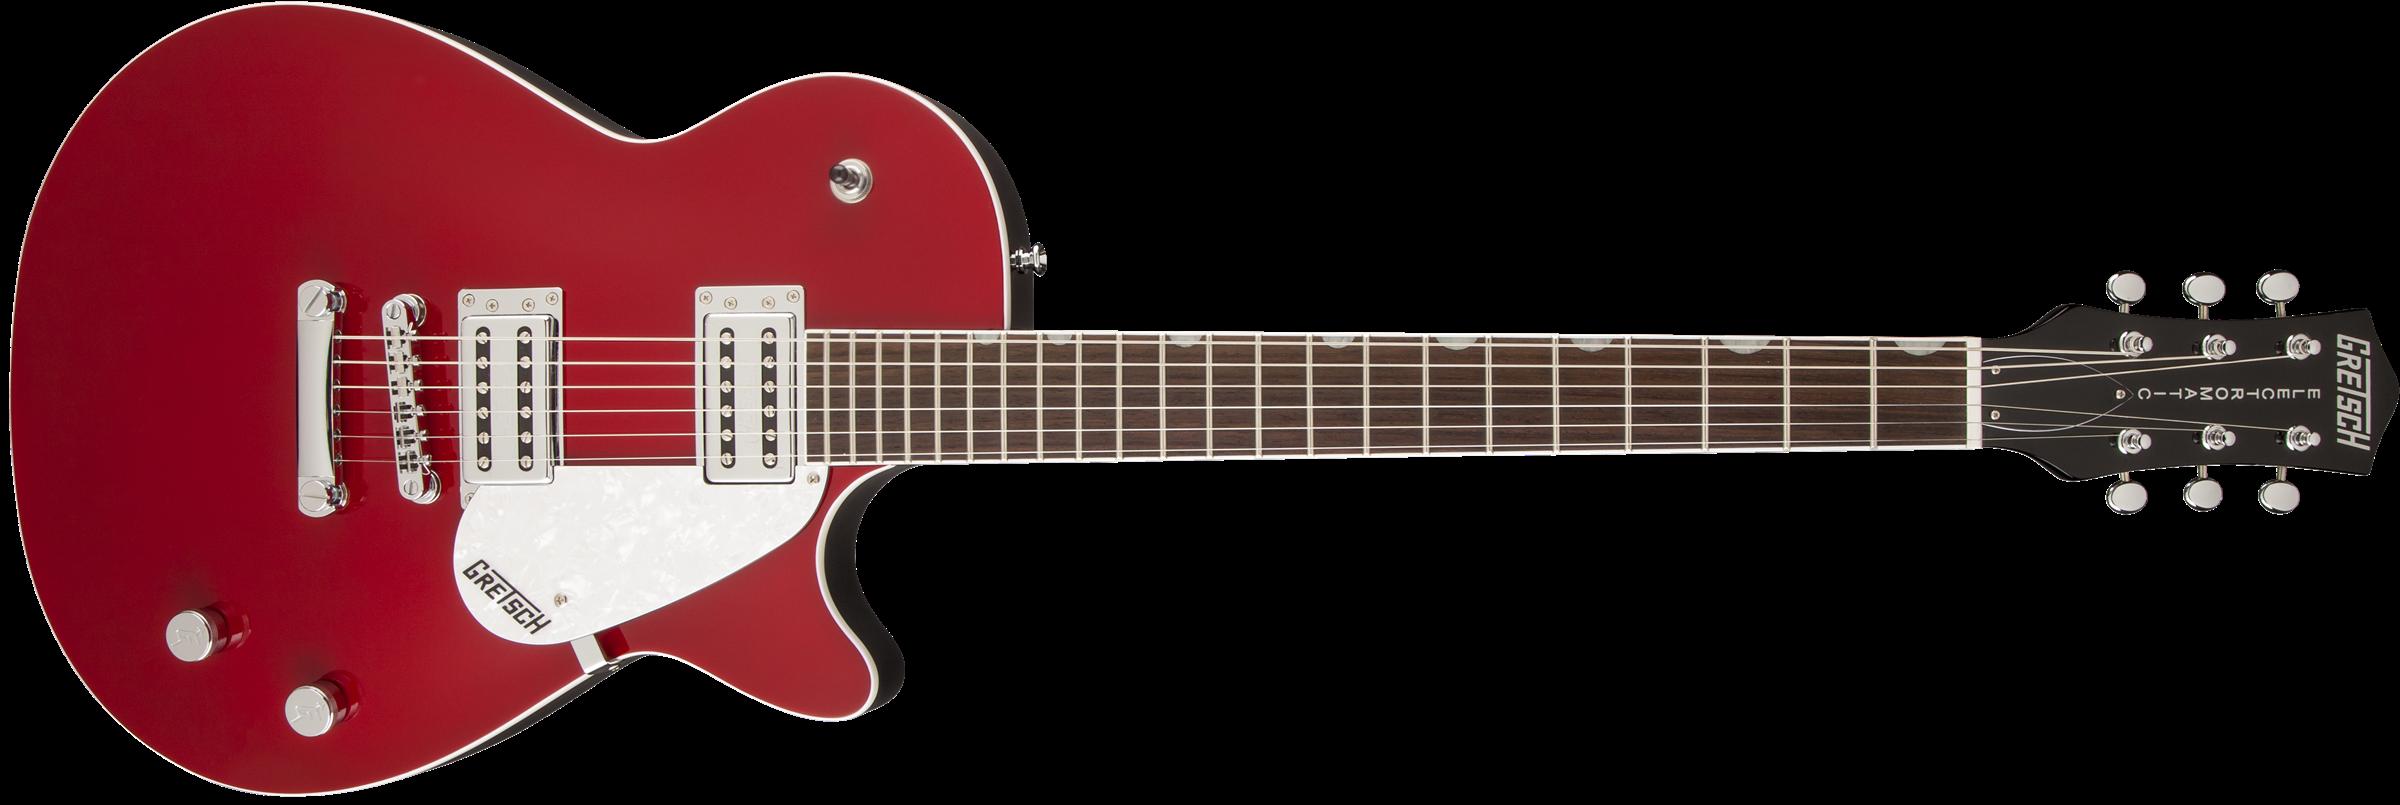 Gretsch G5425 Electromatic Jet Club - Firebird Red